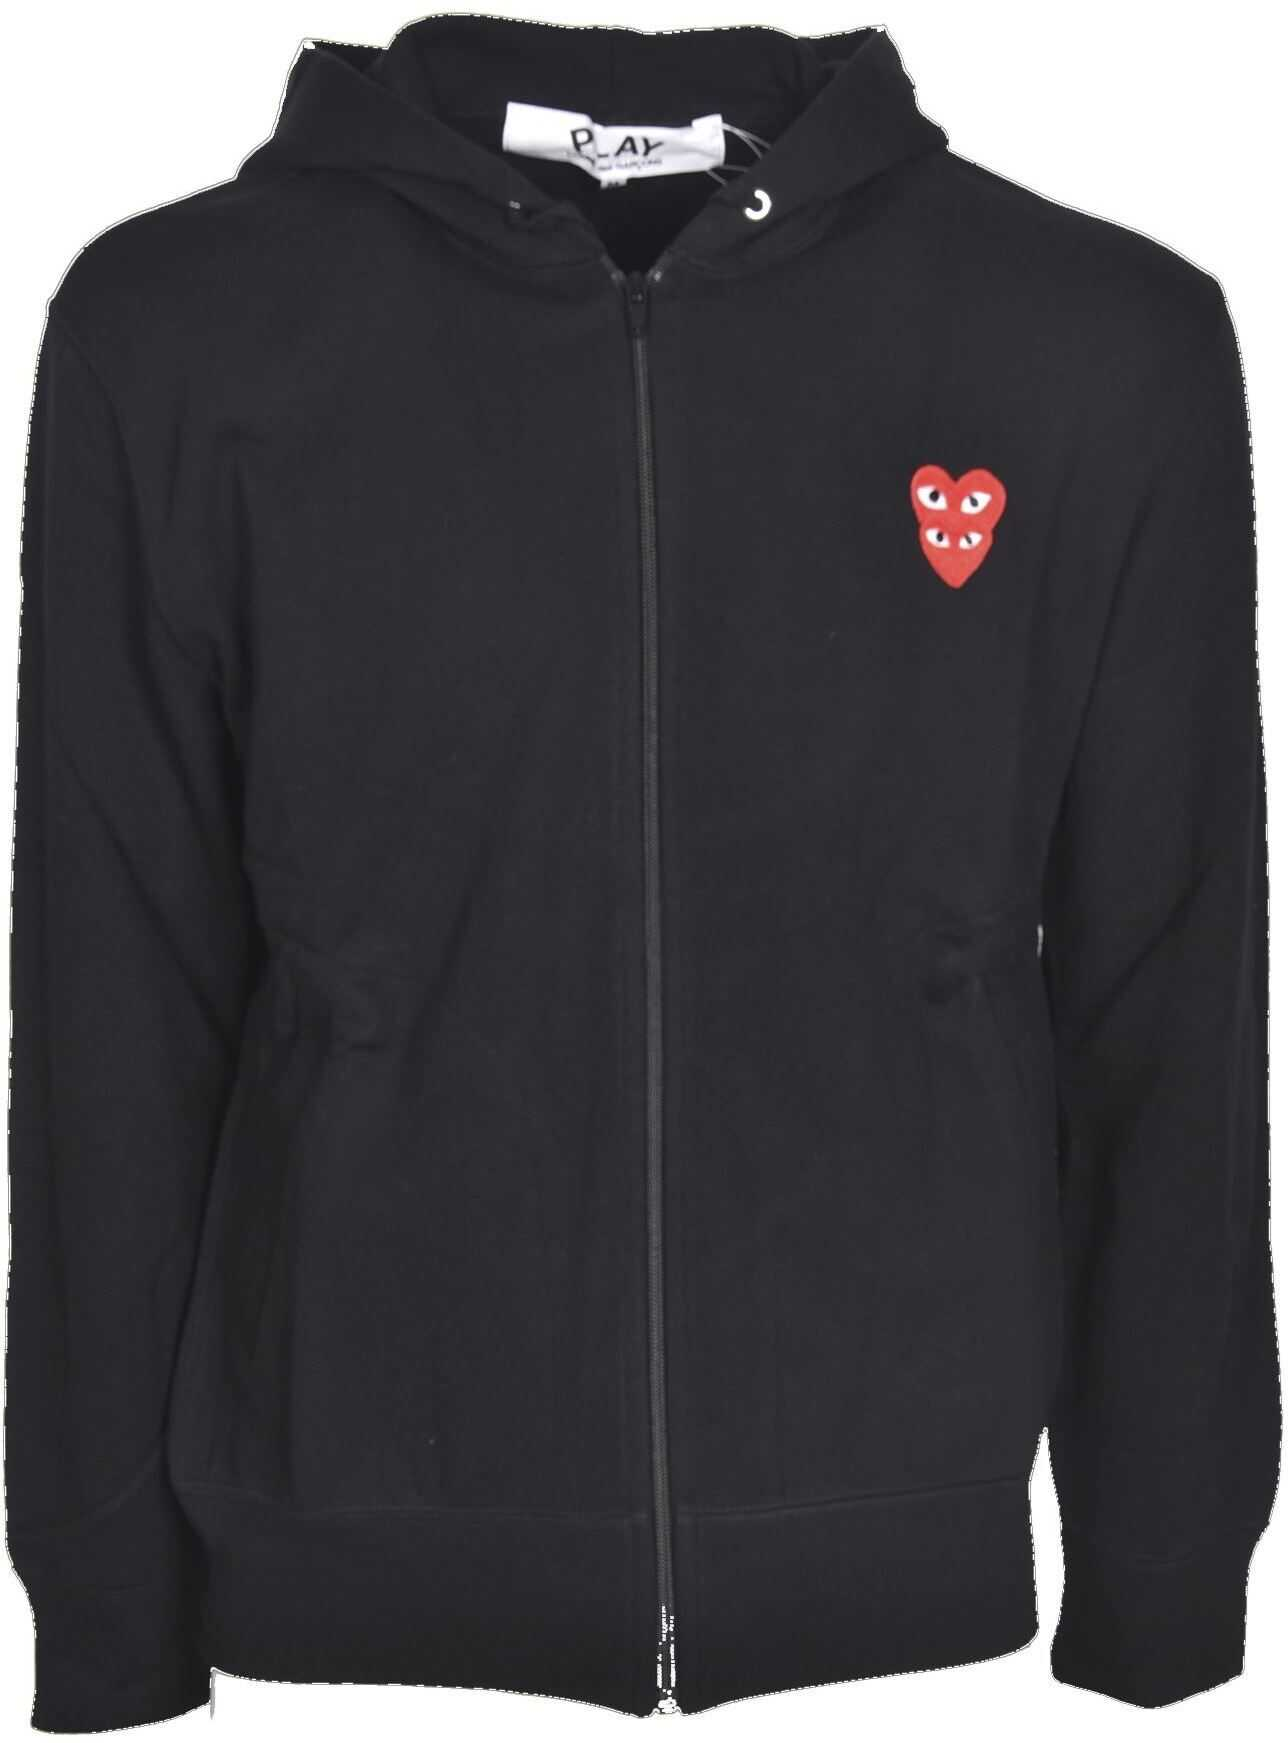 Comme des Garçons Double Red Heart Sweatshirt In Black Black imagine